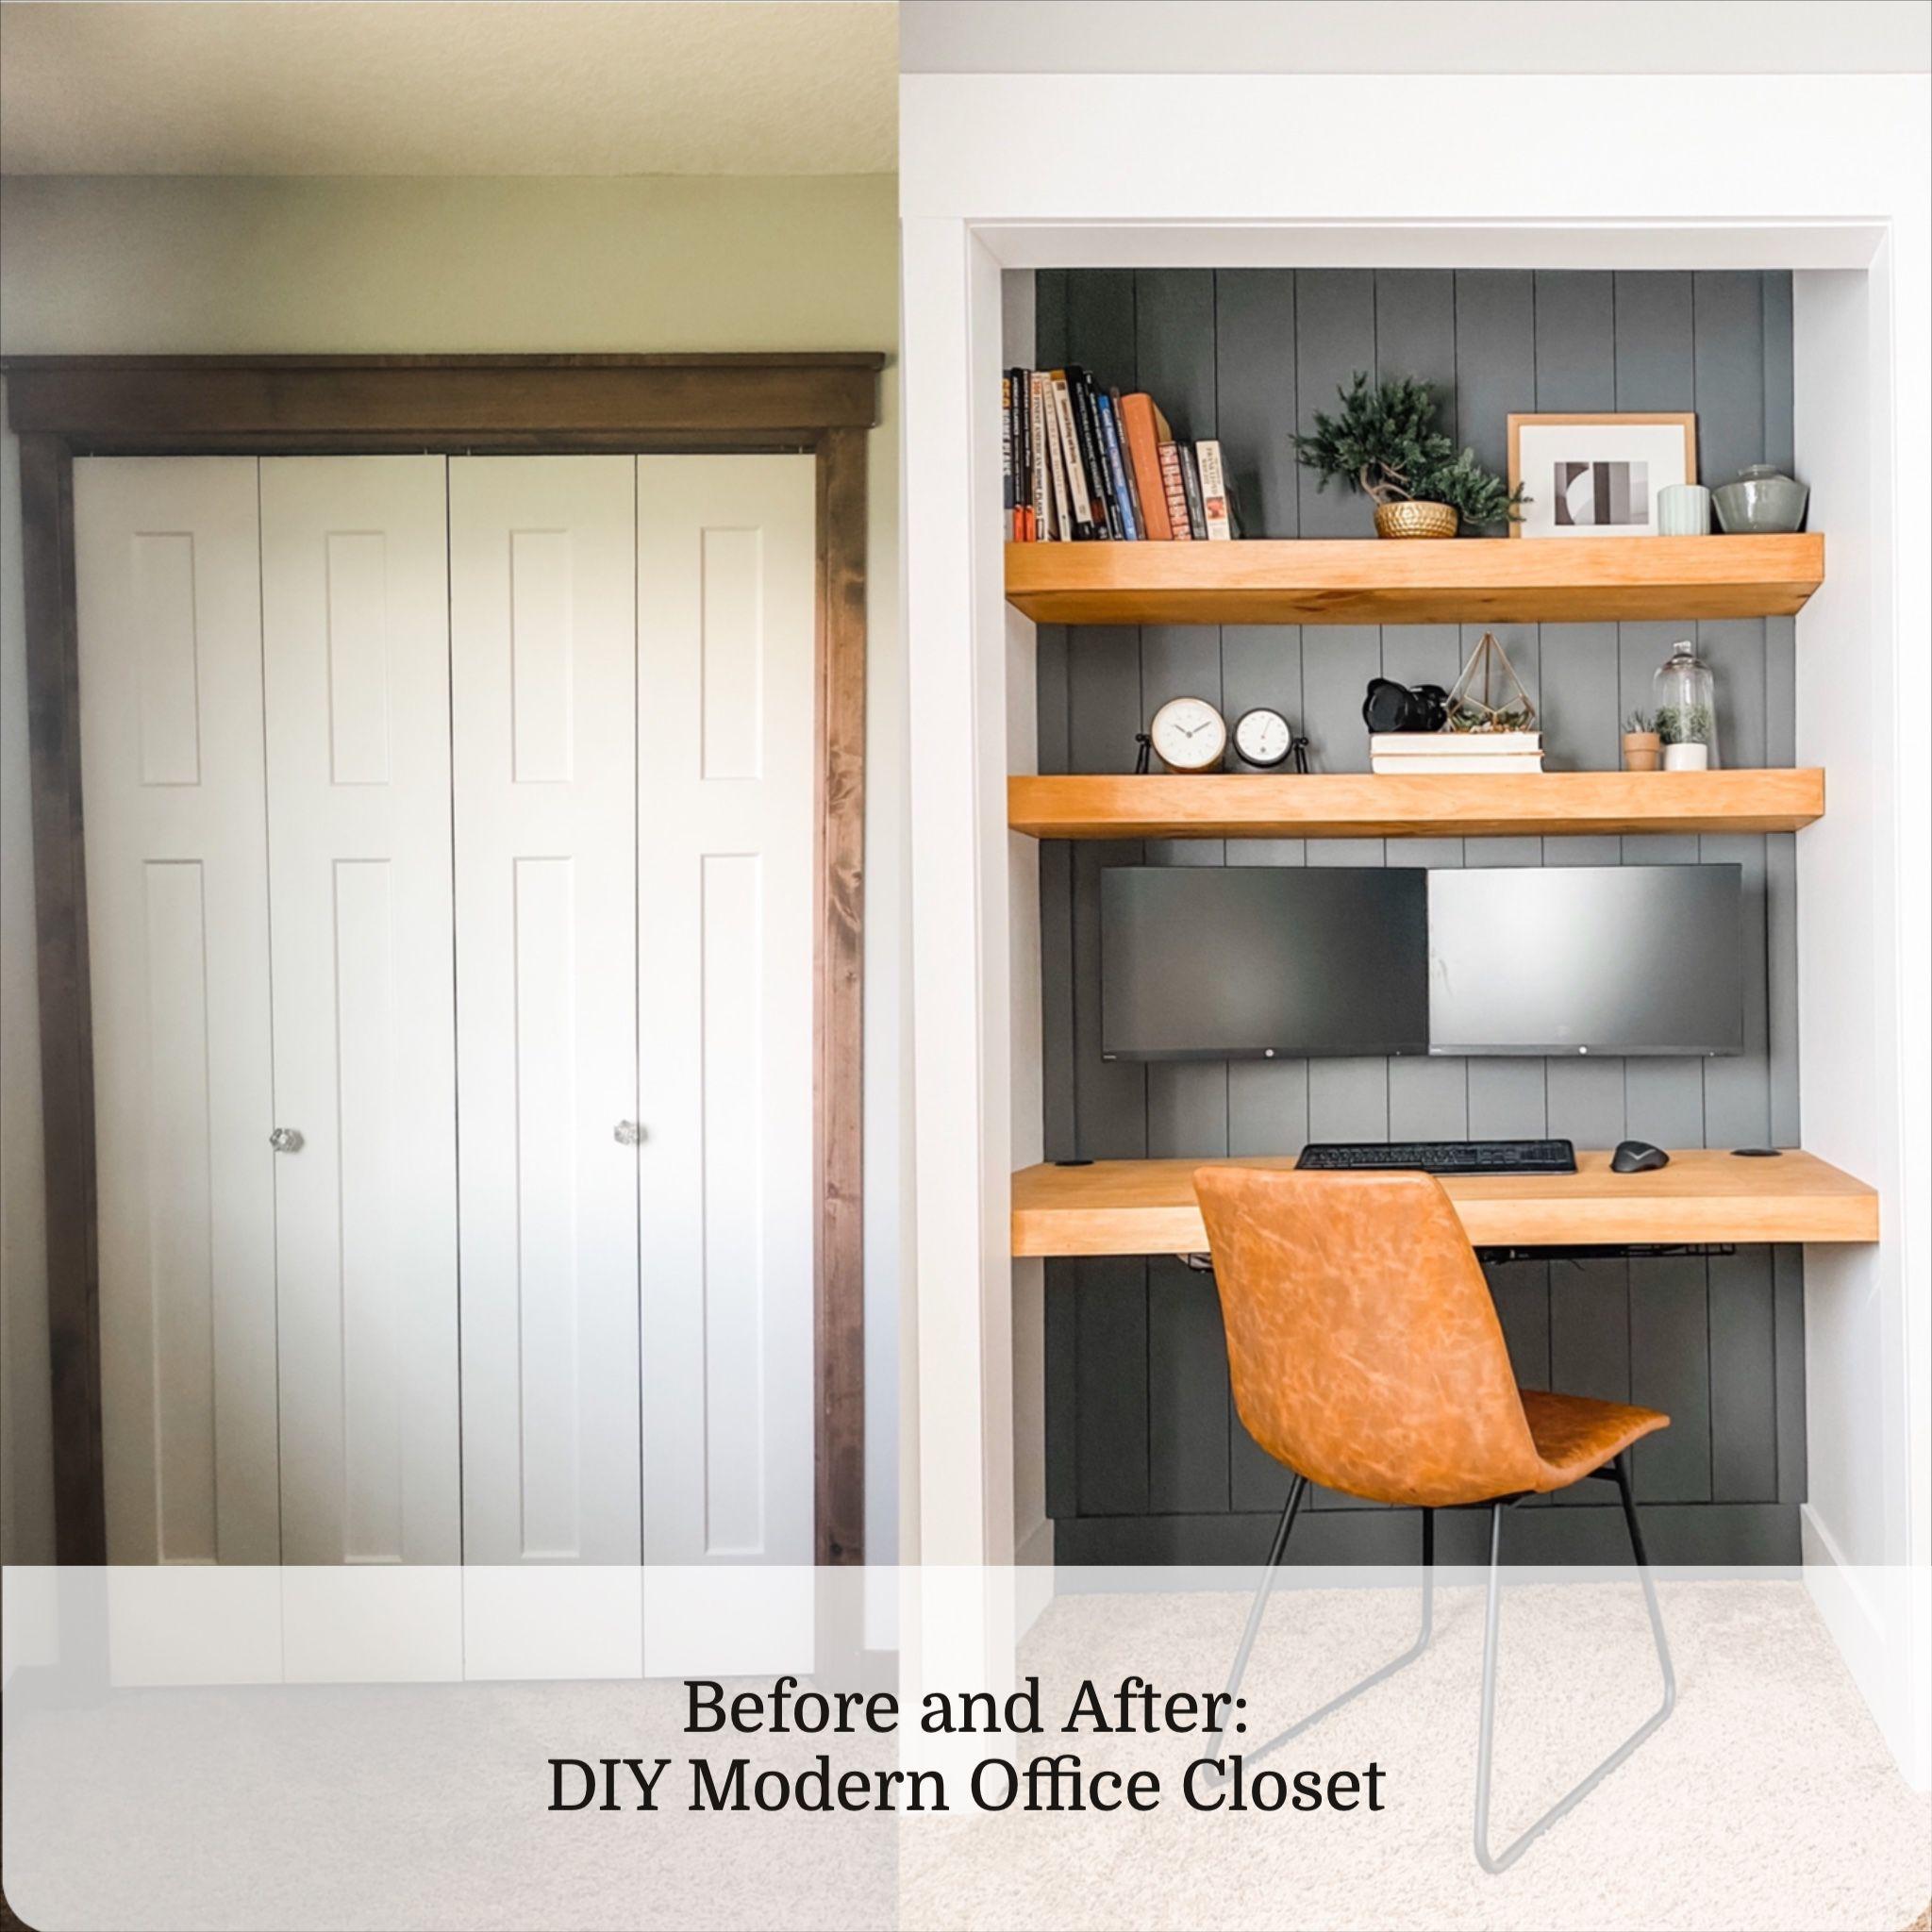 Diy modern office closet in 2020 small bedroom office